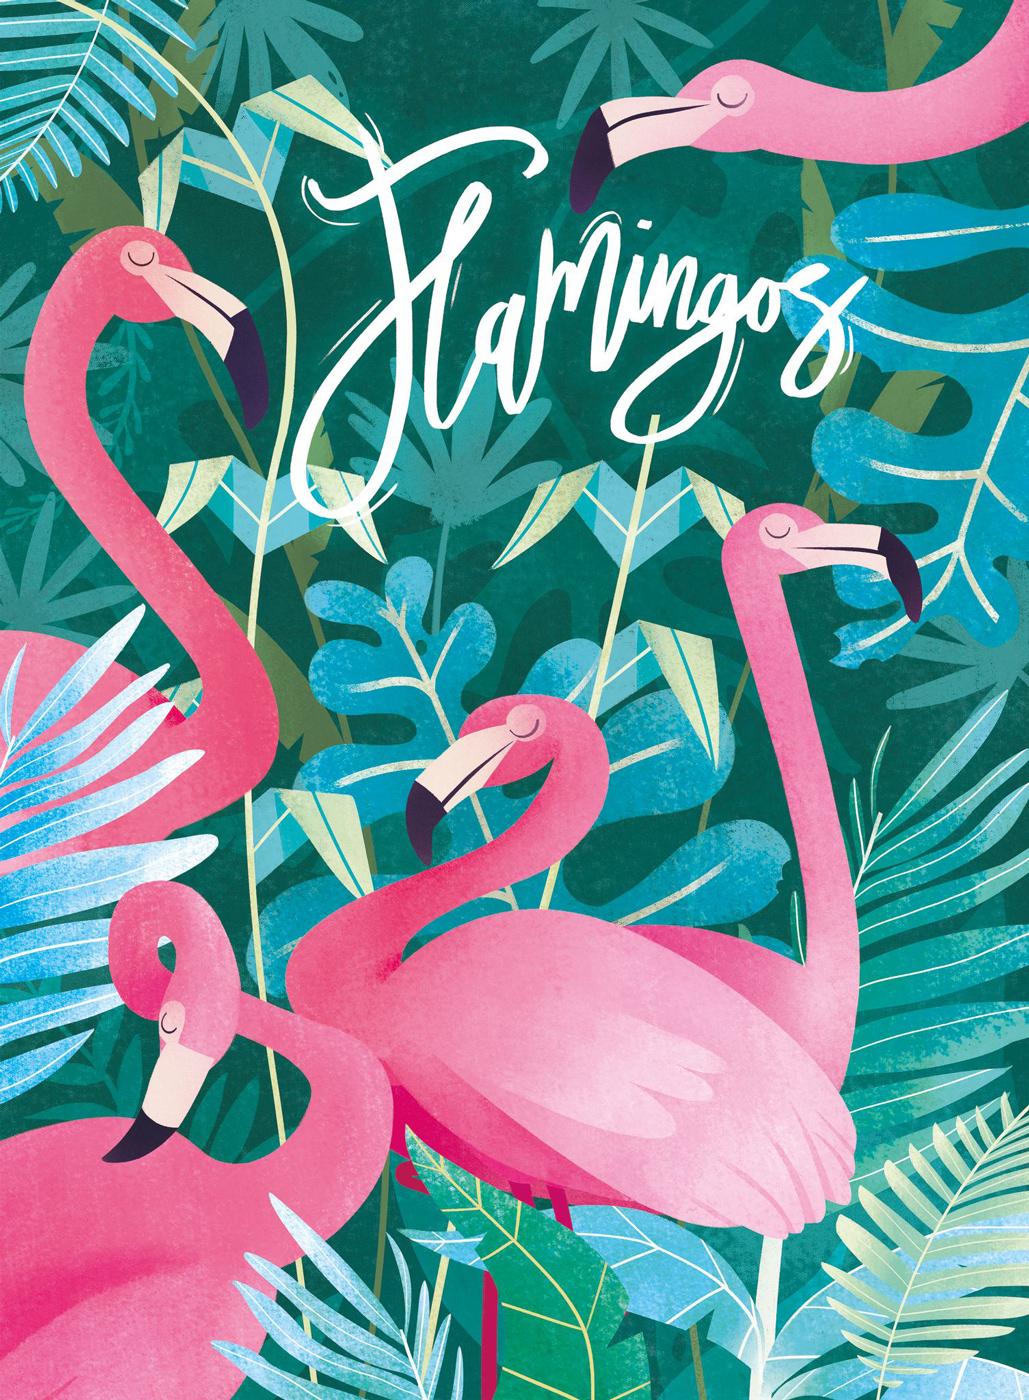 Flamingos Birds Jigsaw Puzzle